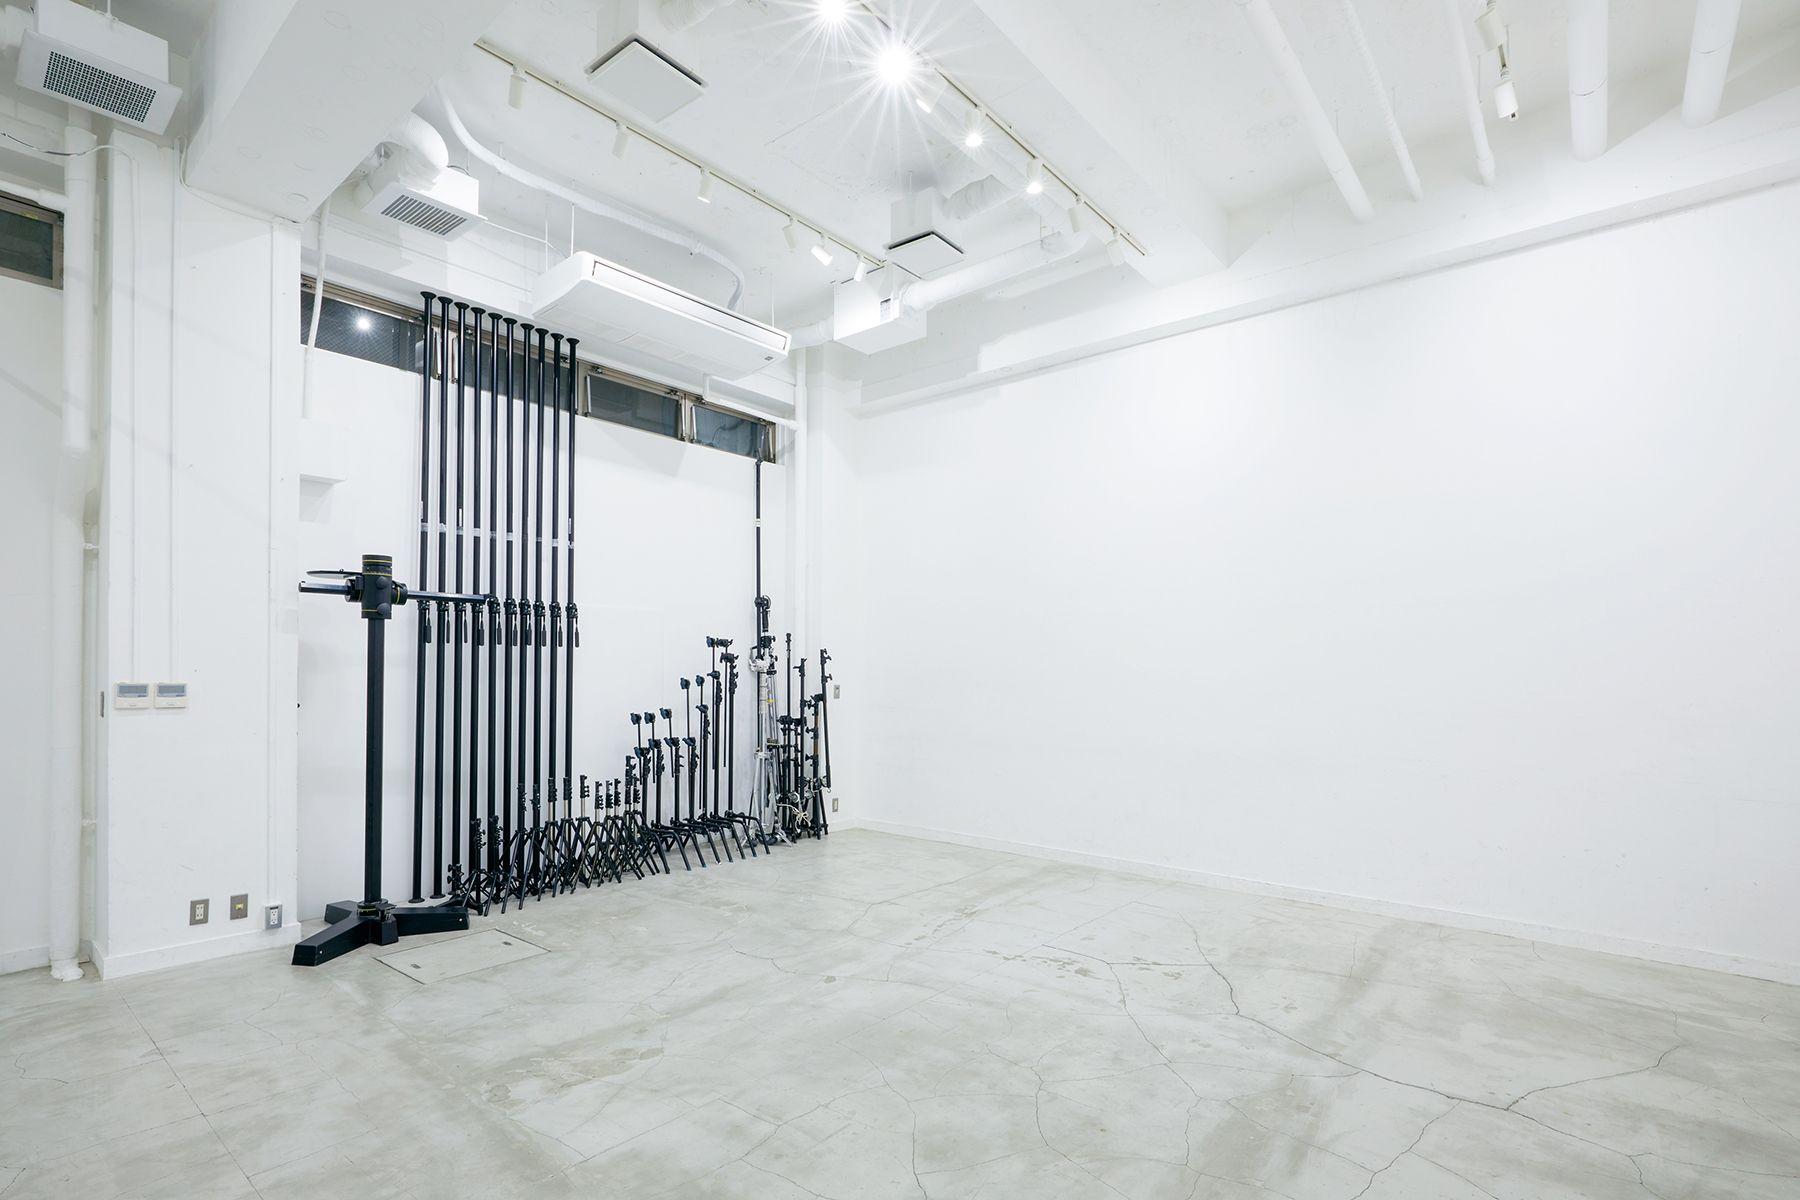 sinca studio 中野坂上 (シンカ スタジオ)商品撮影に嬉しい常備機材が豊富